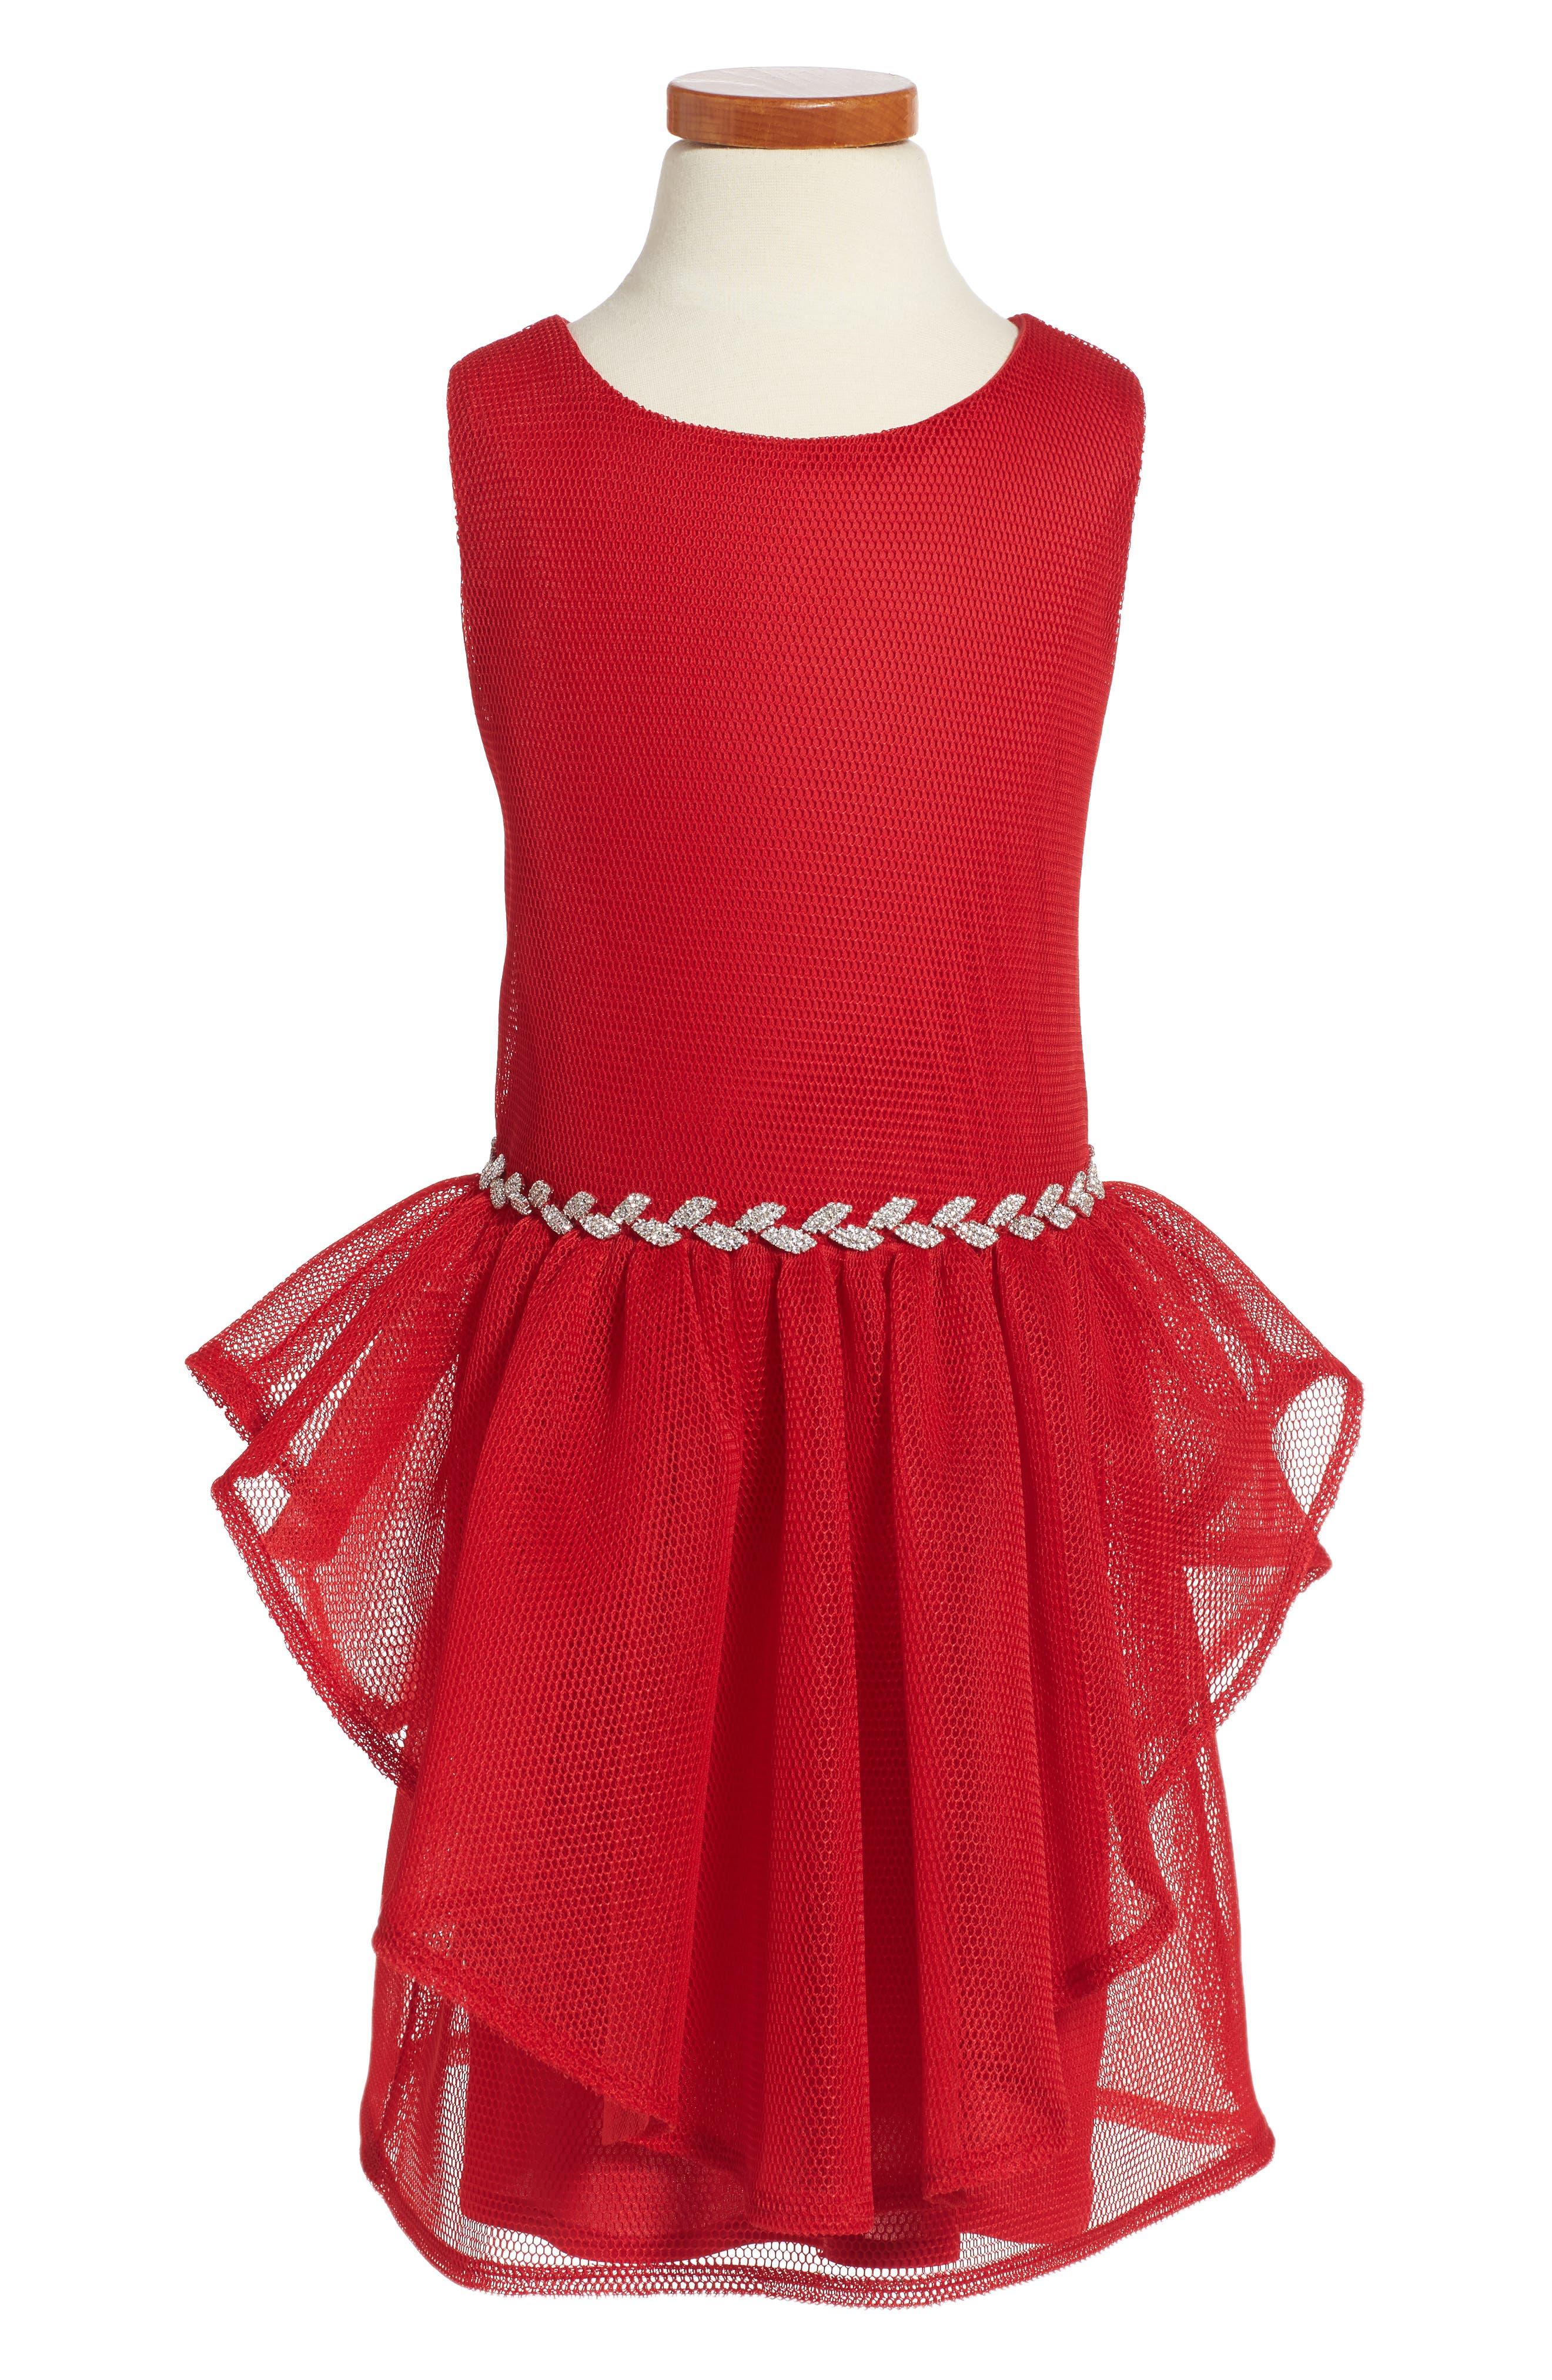 David Charles Embellished Mesh Dress (Big Girls)